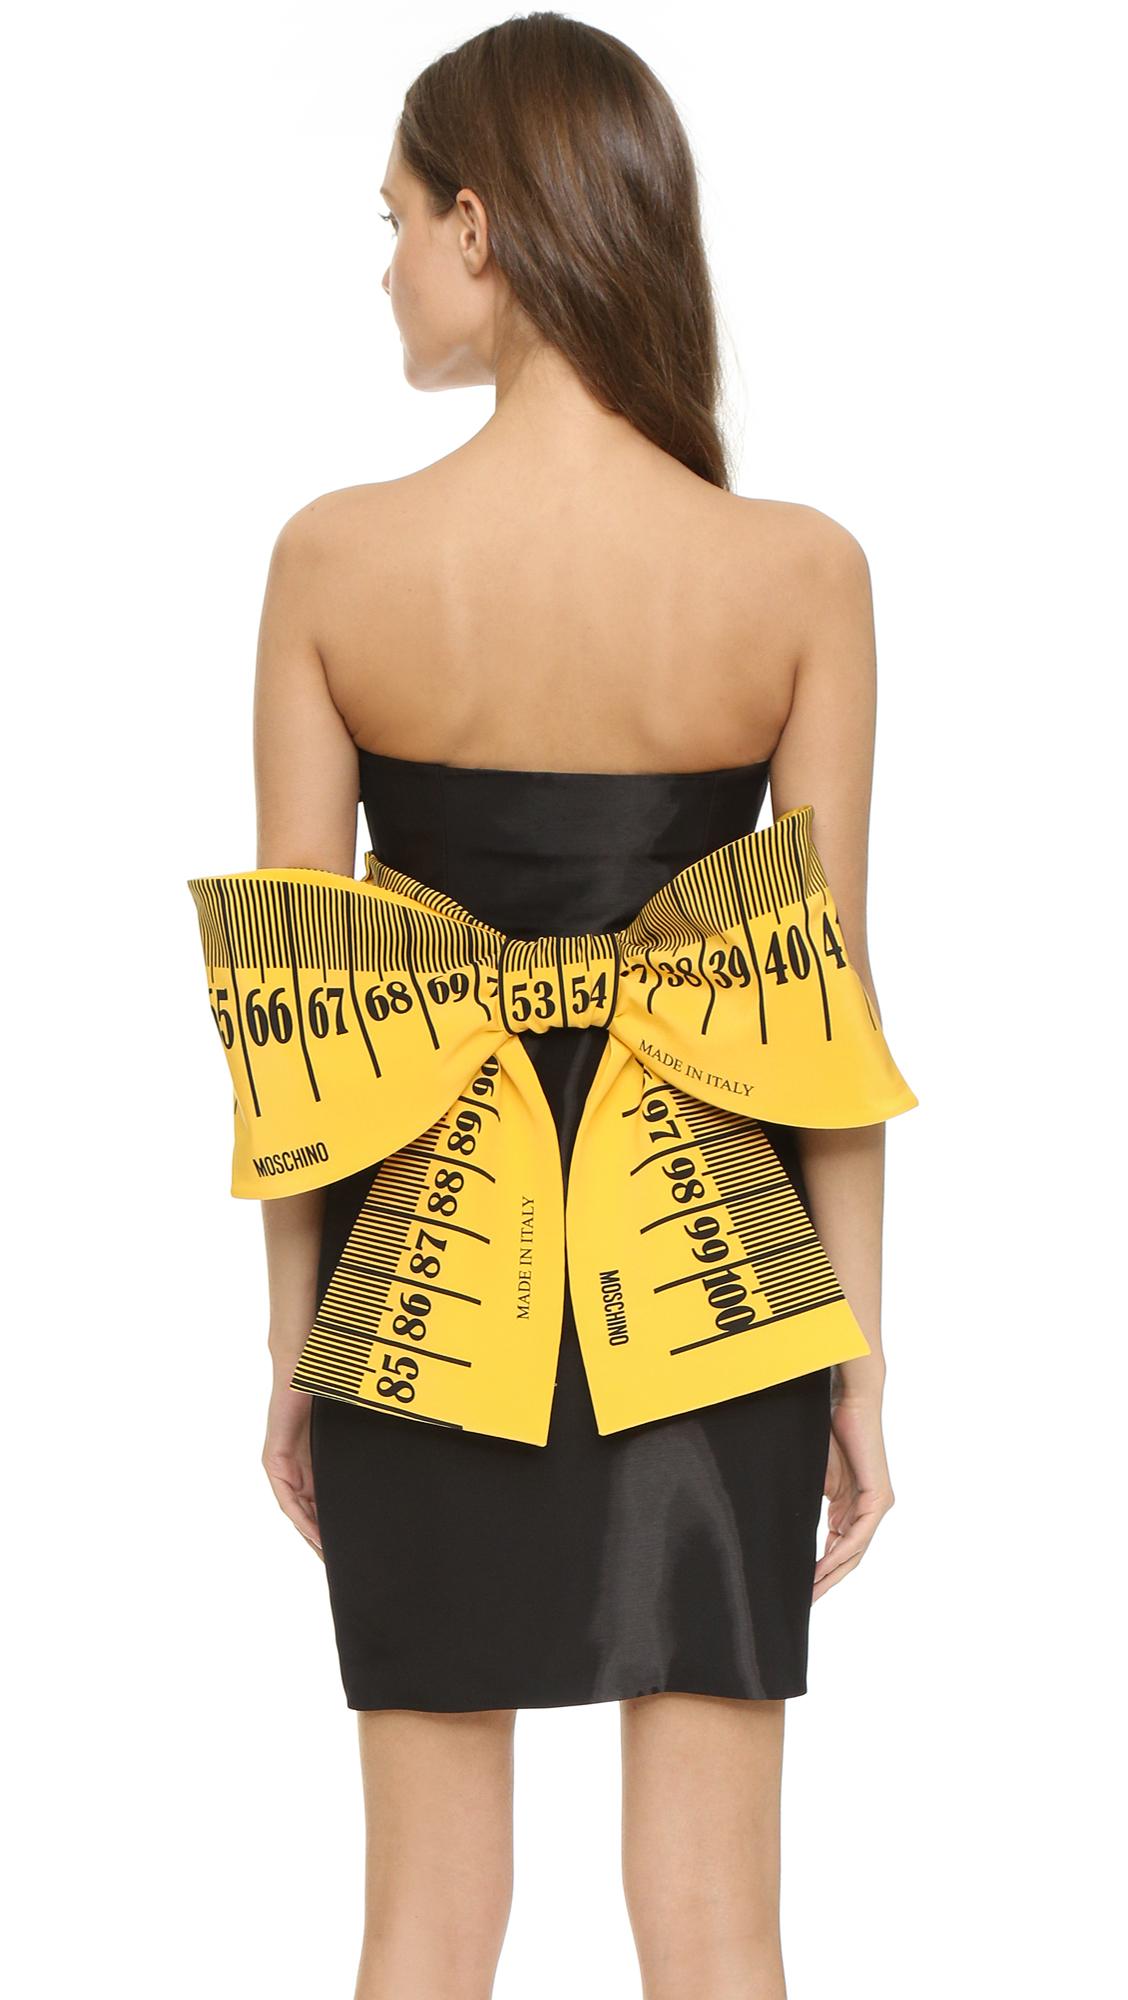 https://cdna.lystit.com/photos/3904-2015/07/09/moschino-black-measuring-tape-dress-black-product-0-328051896-normal.jpeg